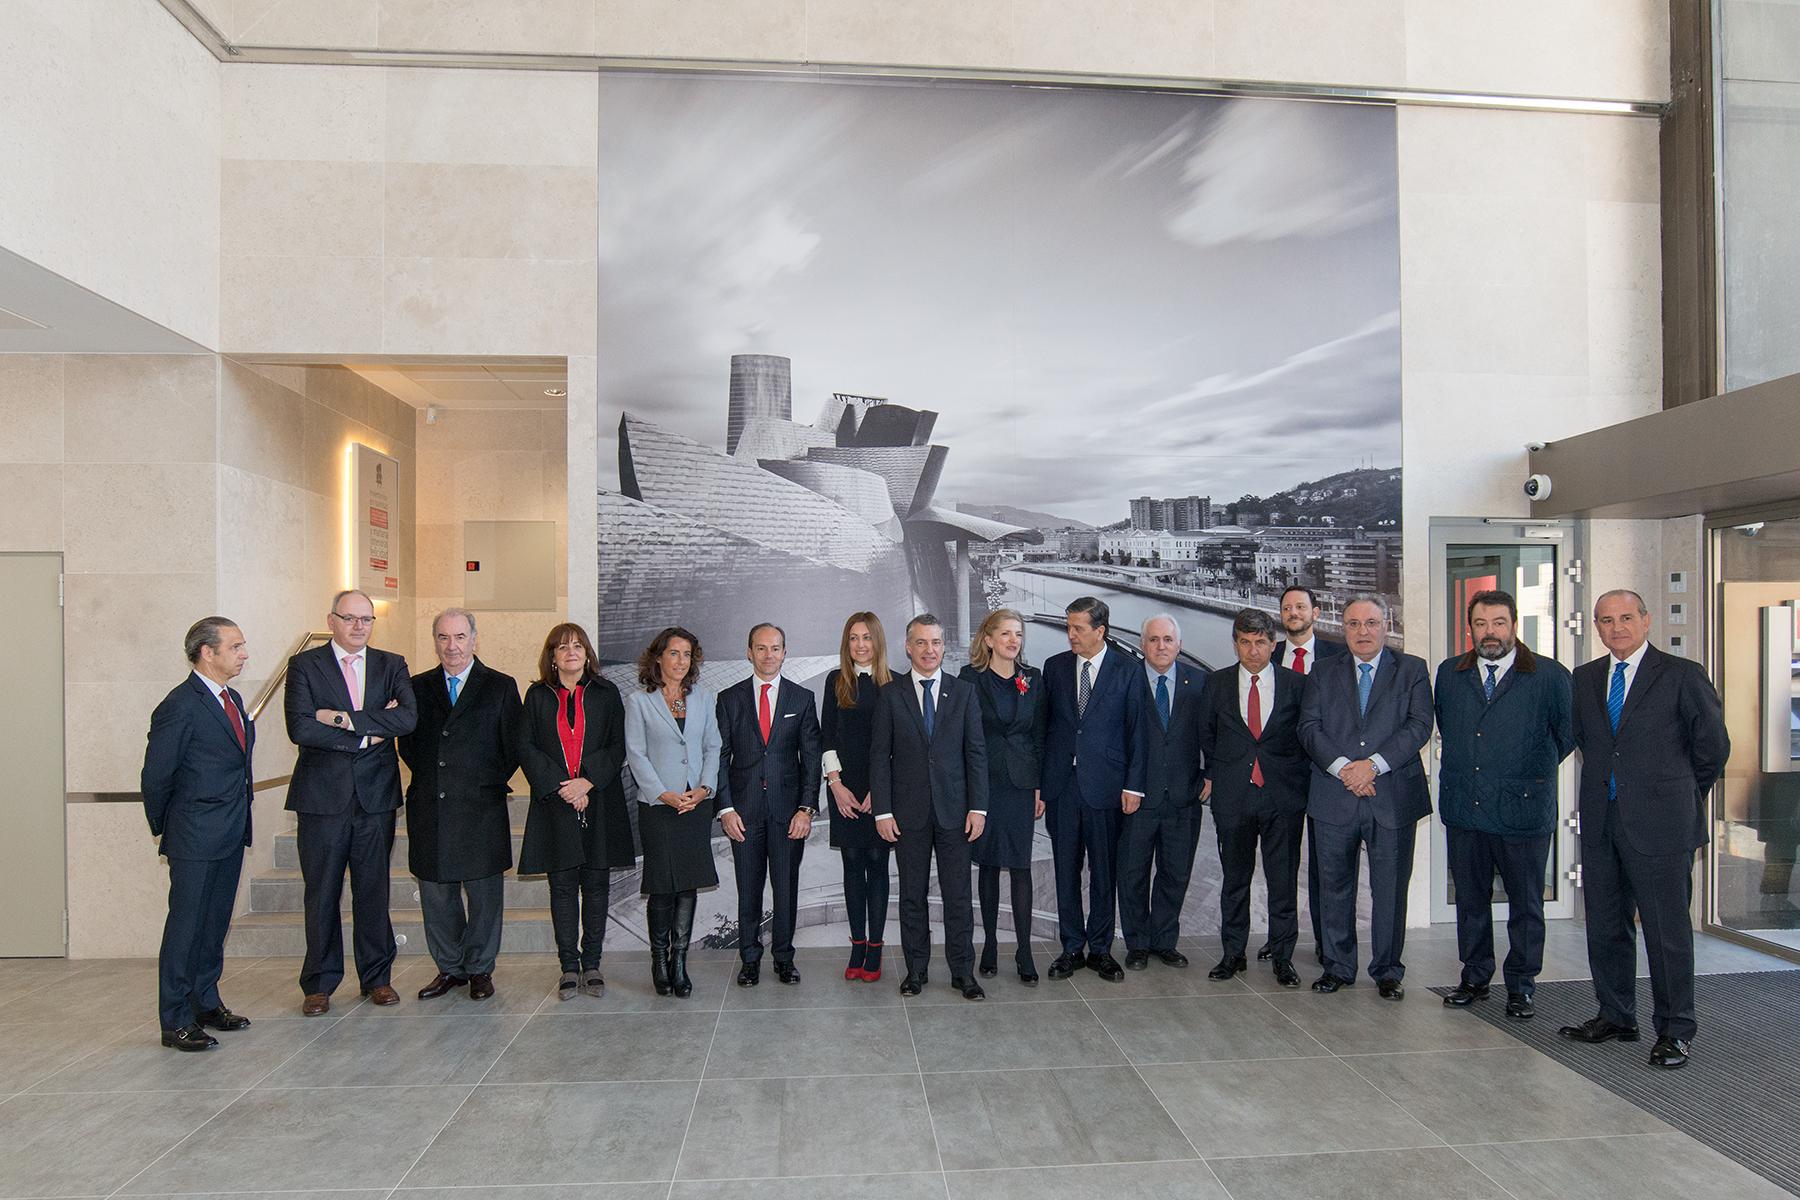 Irekia eusko jaurlaritza gobierno vasco el for Oficinas banco bilbao